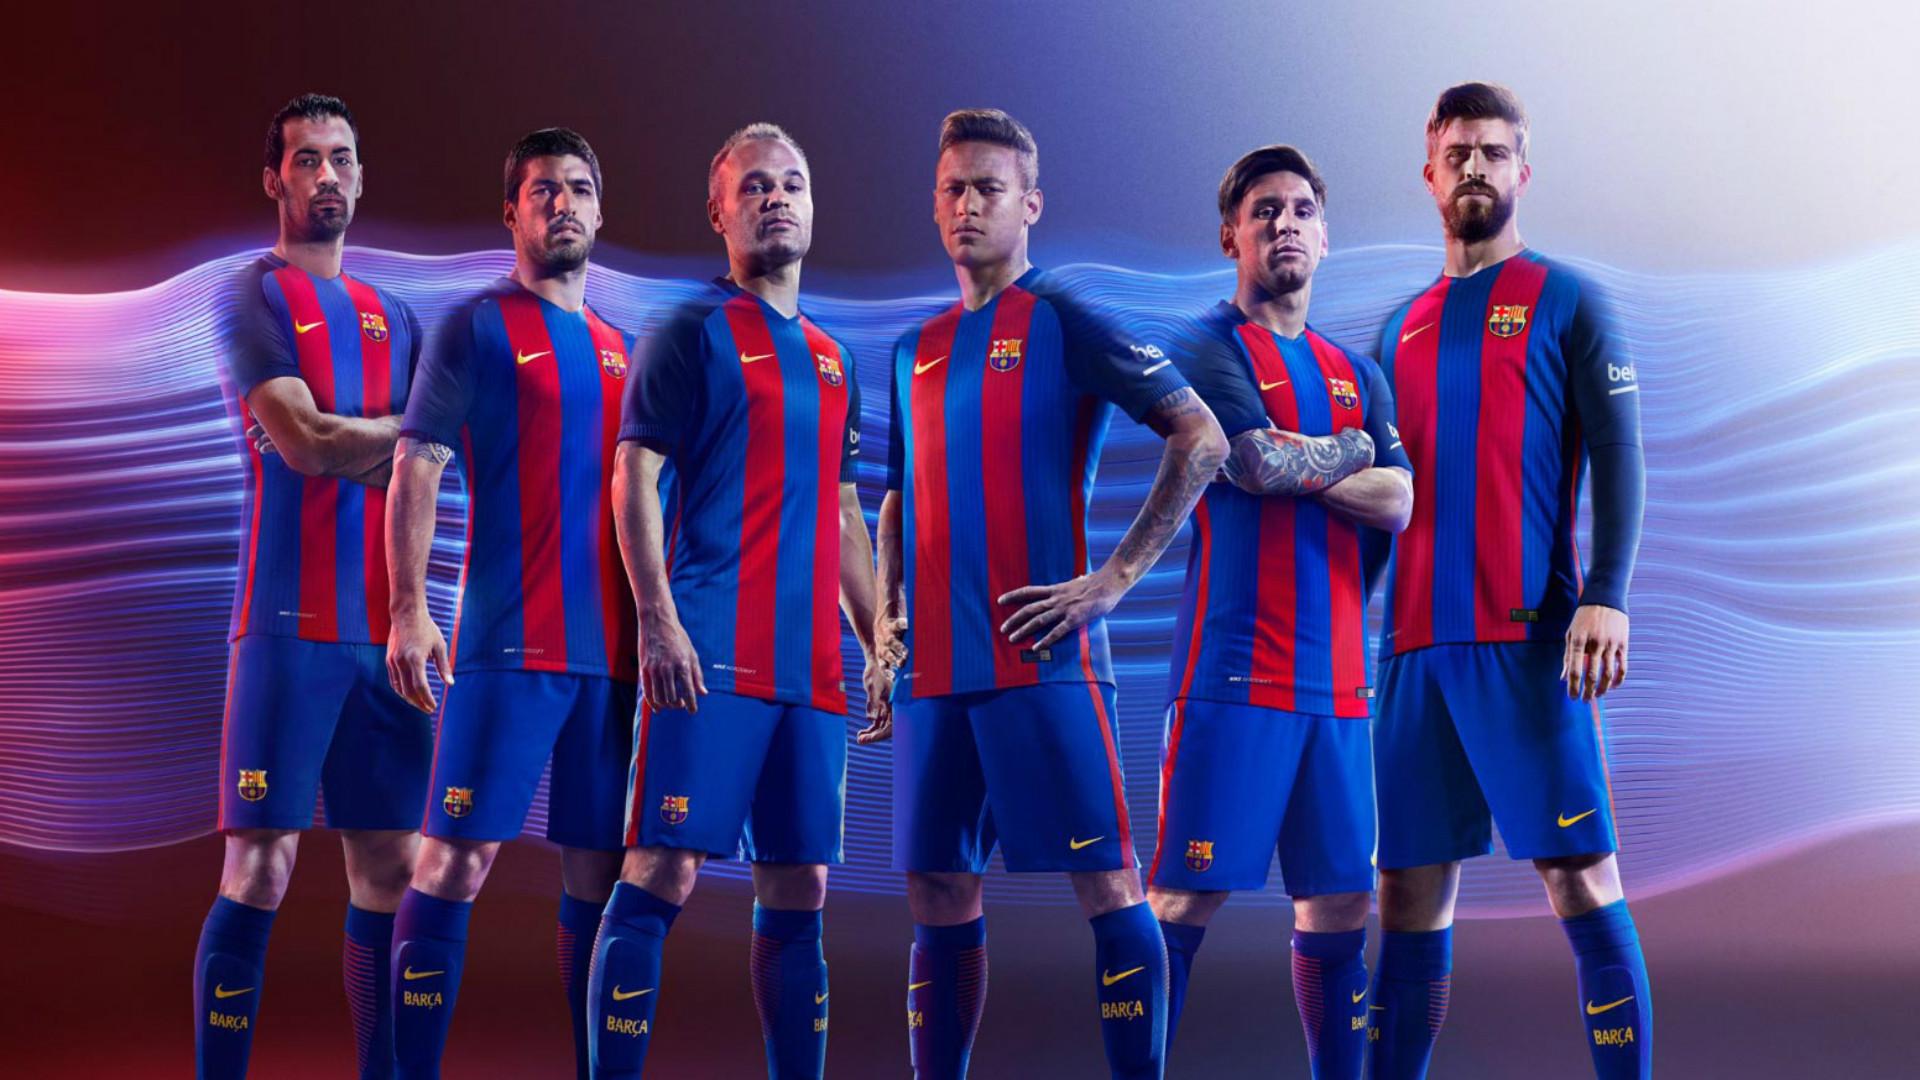 Daftar Lengkap Nominasi 100 Jersey Terbaik 2016 17 Celana Bola Grade Ori Madrid Away 2019 Barcelona Kit